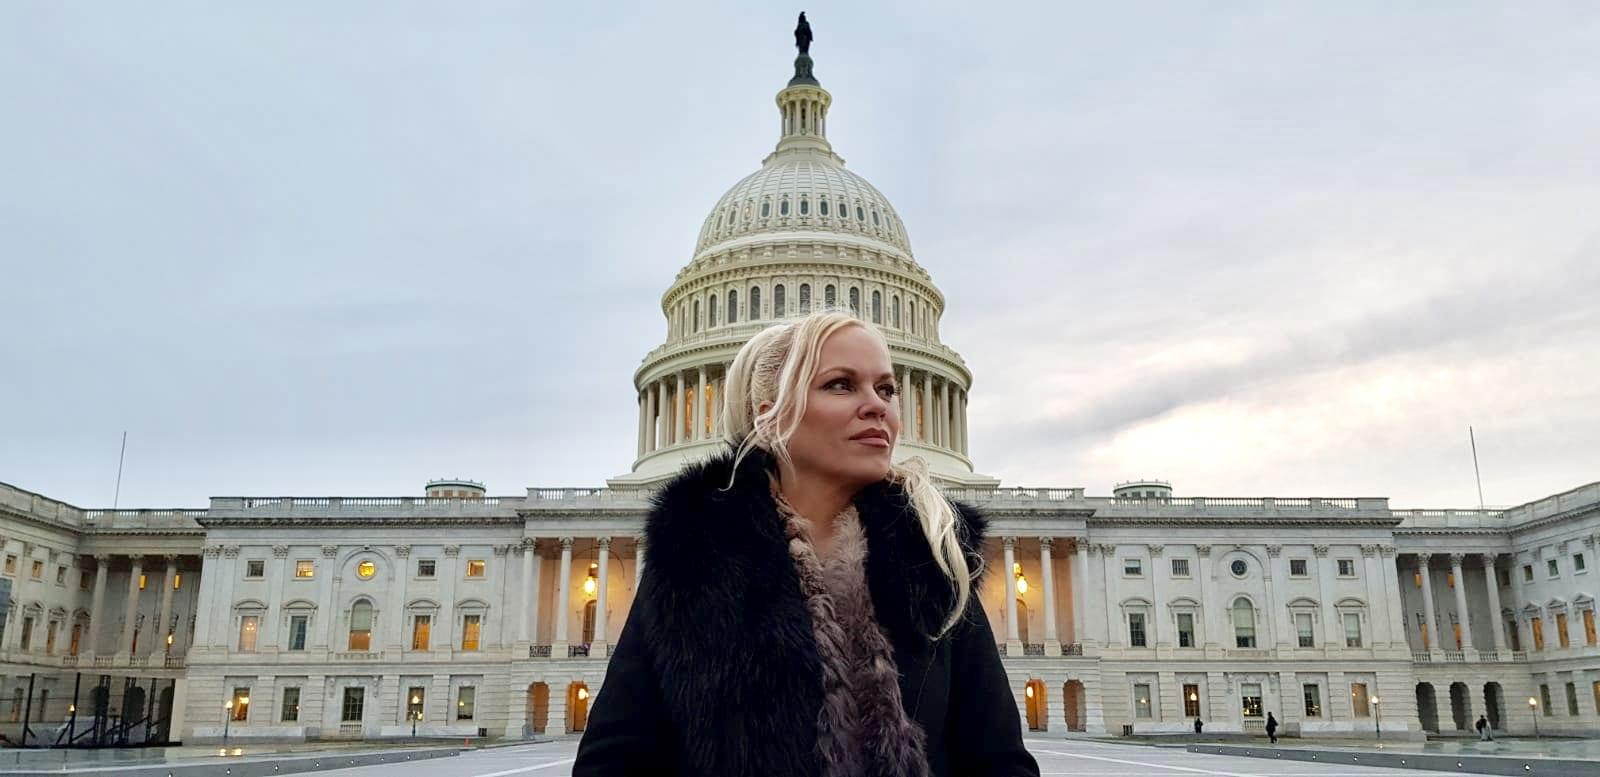 Hanne Nabintu Herland Report Capitol Hill Washington DC